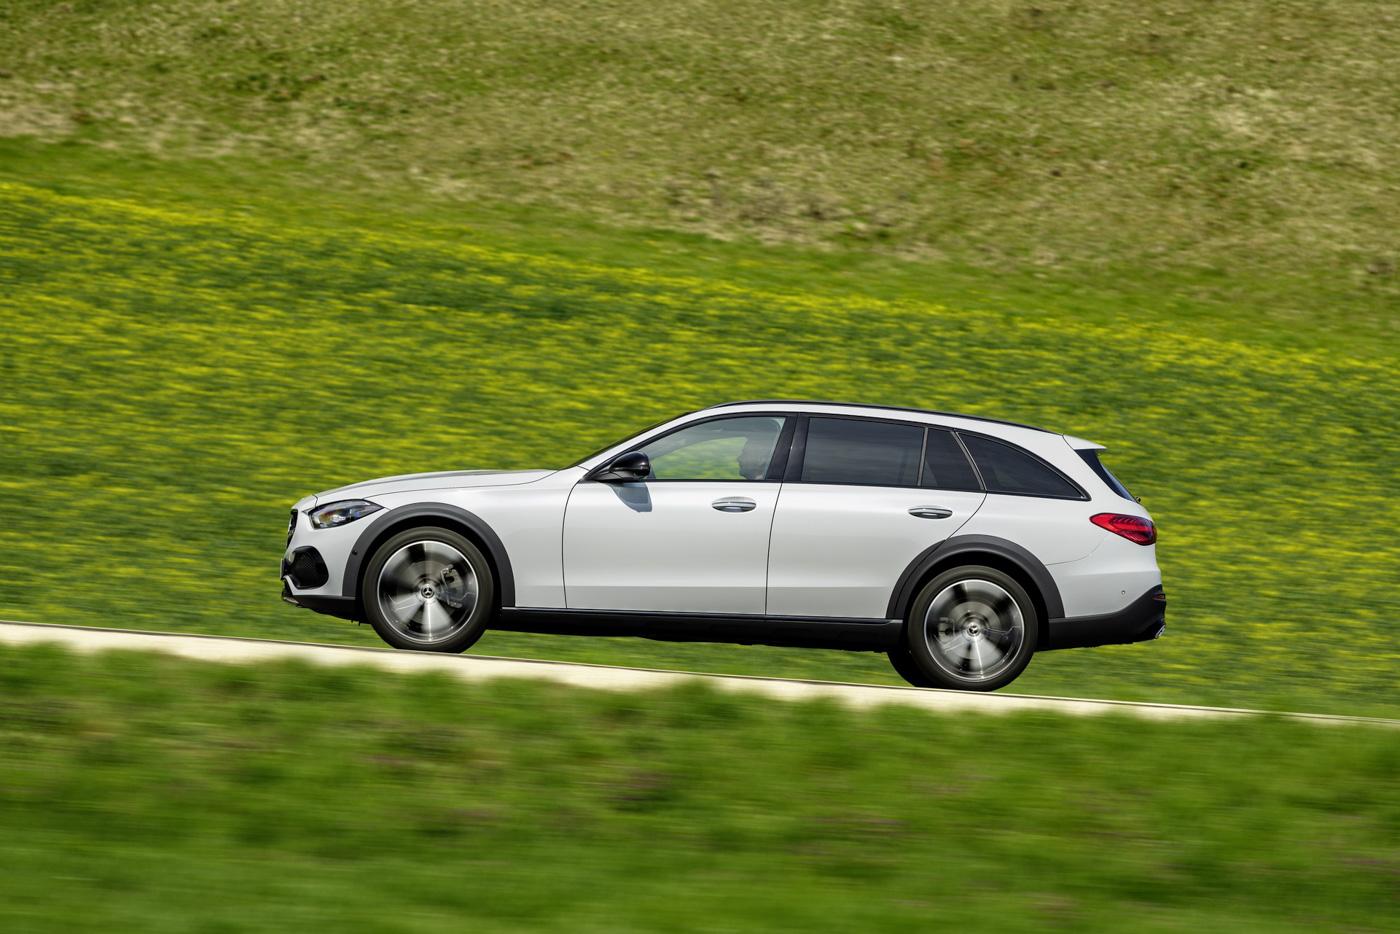 Mercedes-benz-c-class-all-terrain-di-den-moi-noi-cung-mau-xe-gia-dinh-day-thuc-dung (7).JPG